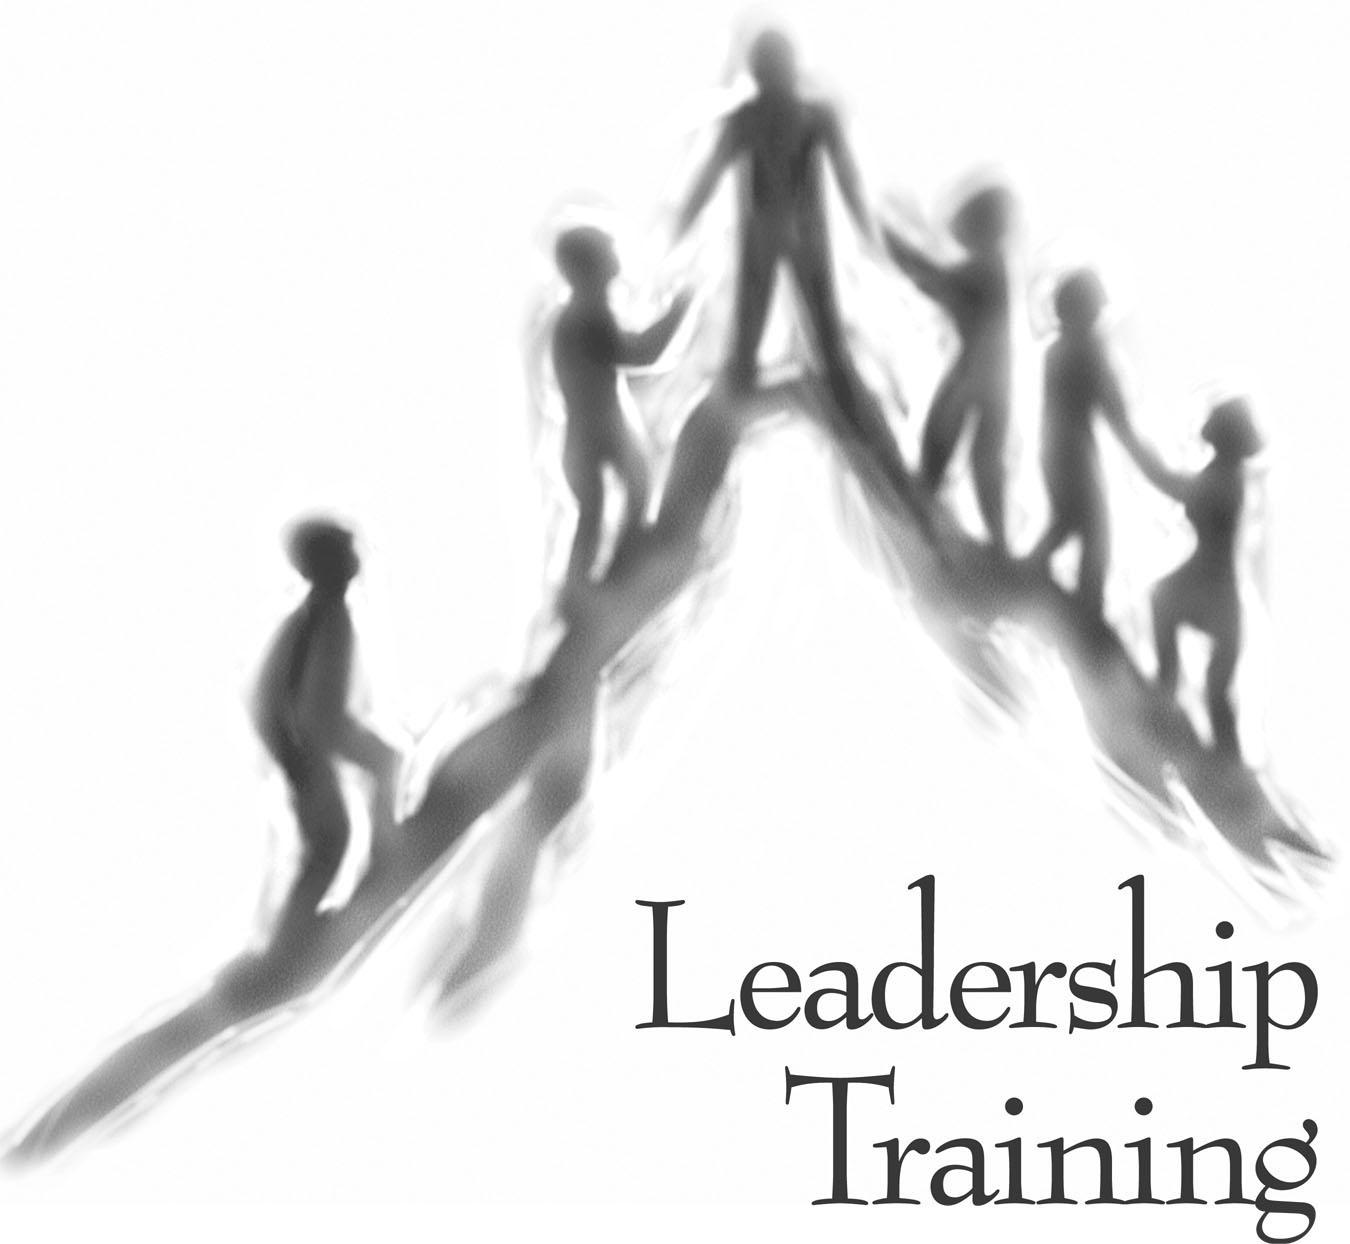 Church leadership training programs